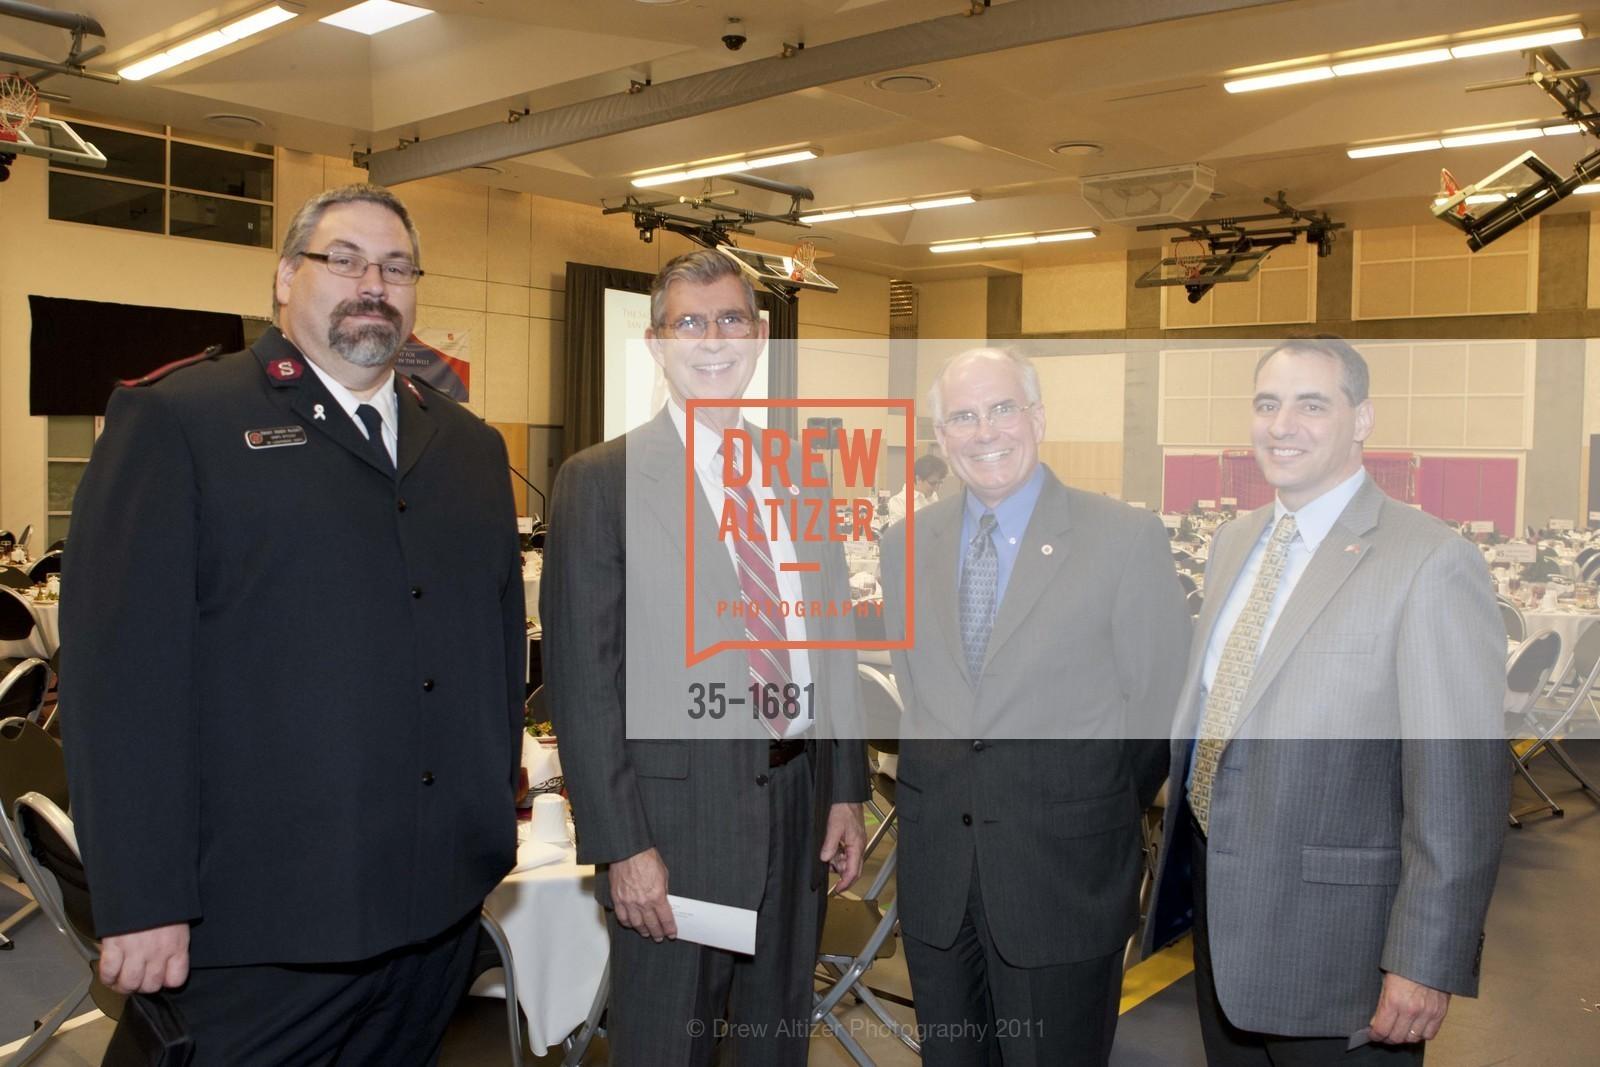 Envoy Roger McCort, Bert Decker, John McKnight, Photo #35-1681